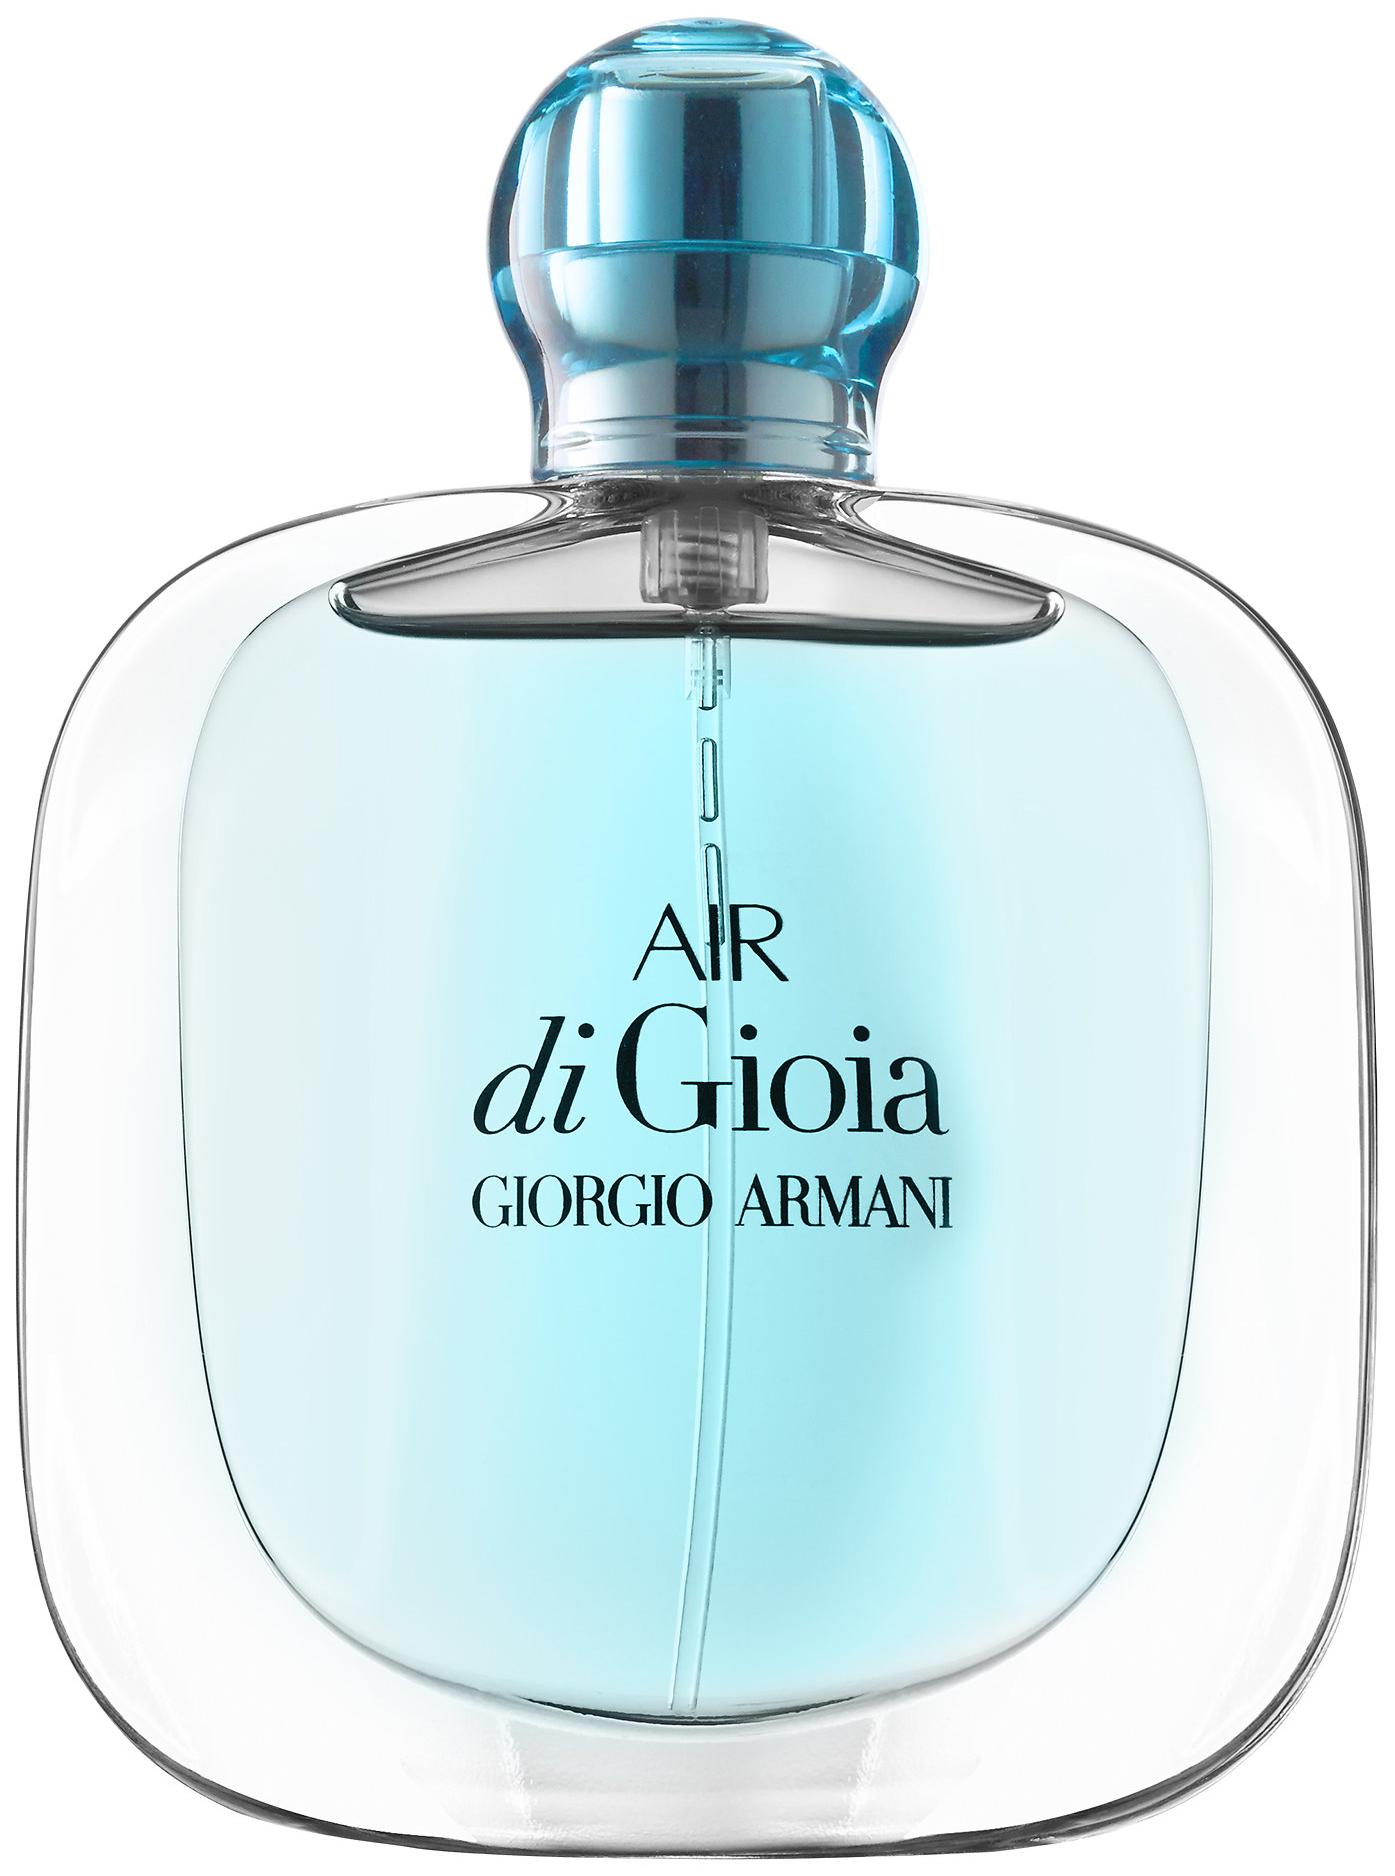 Парфюмерная вода Giorgio Armani Air di Gioia Pour Femme 50 мл фото